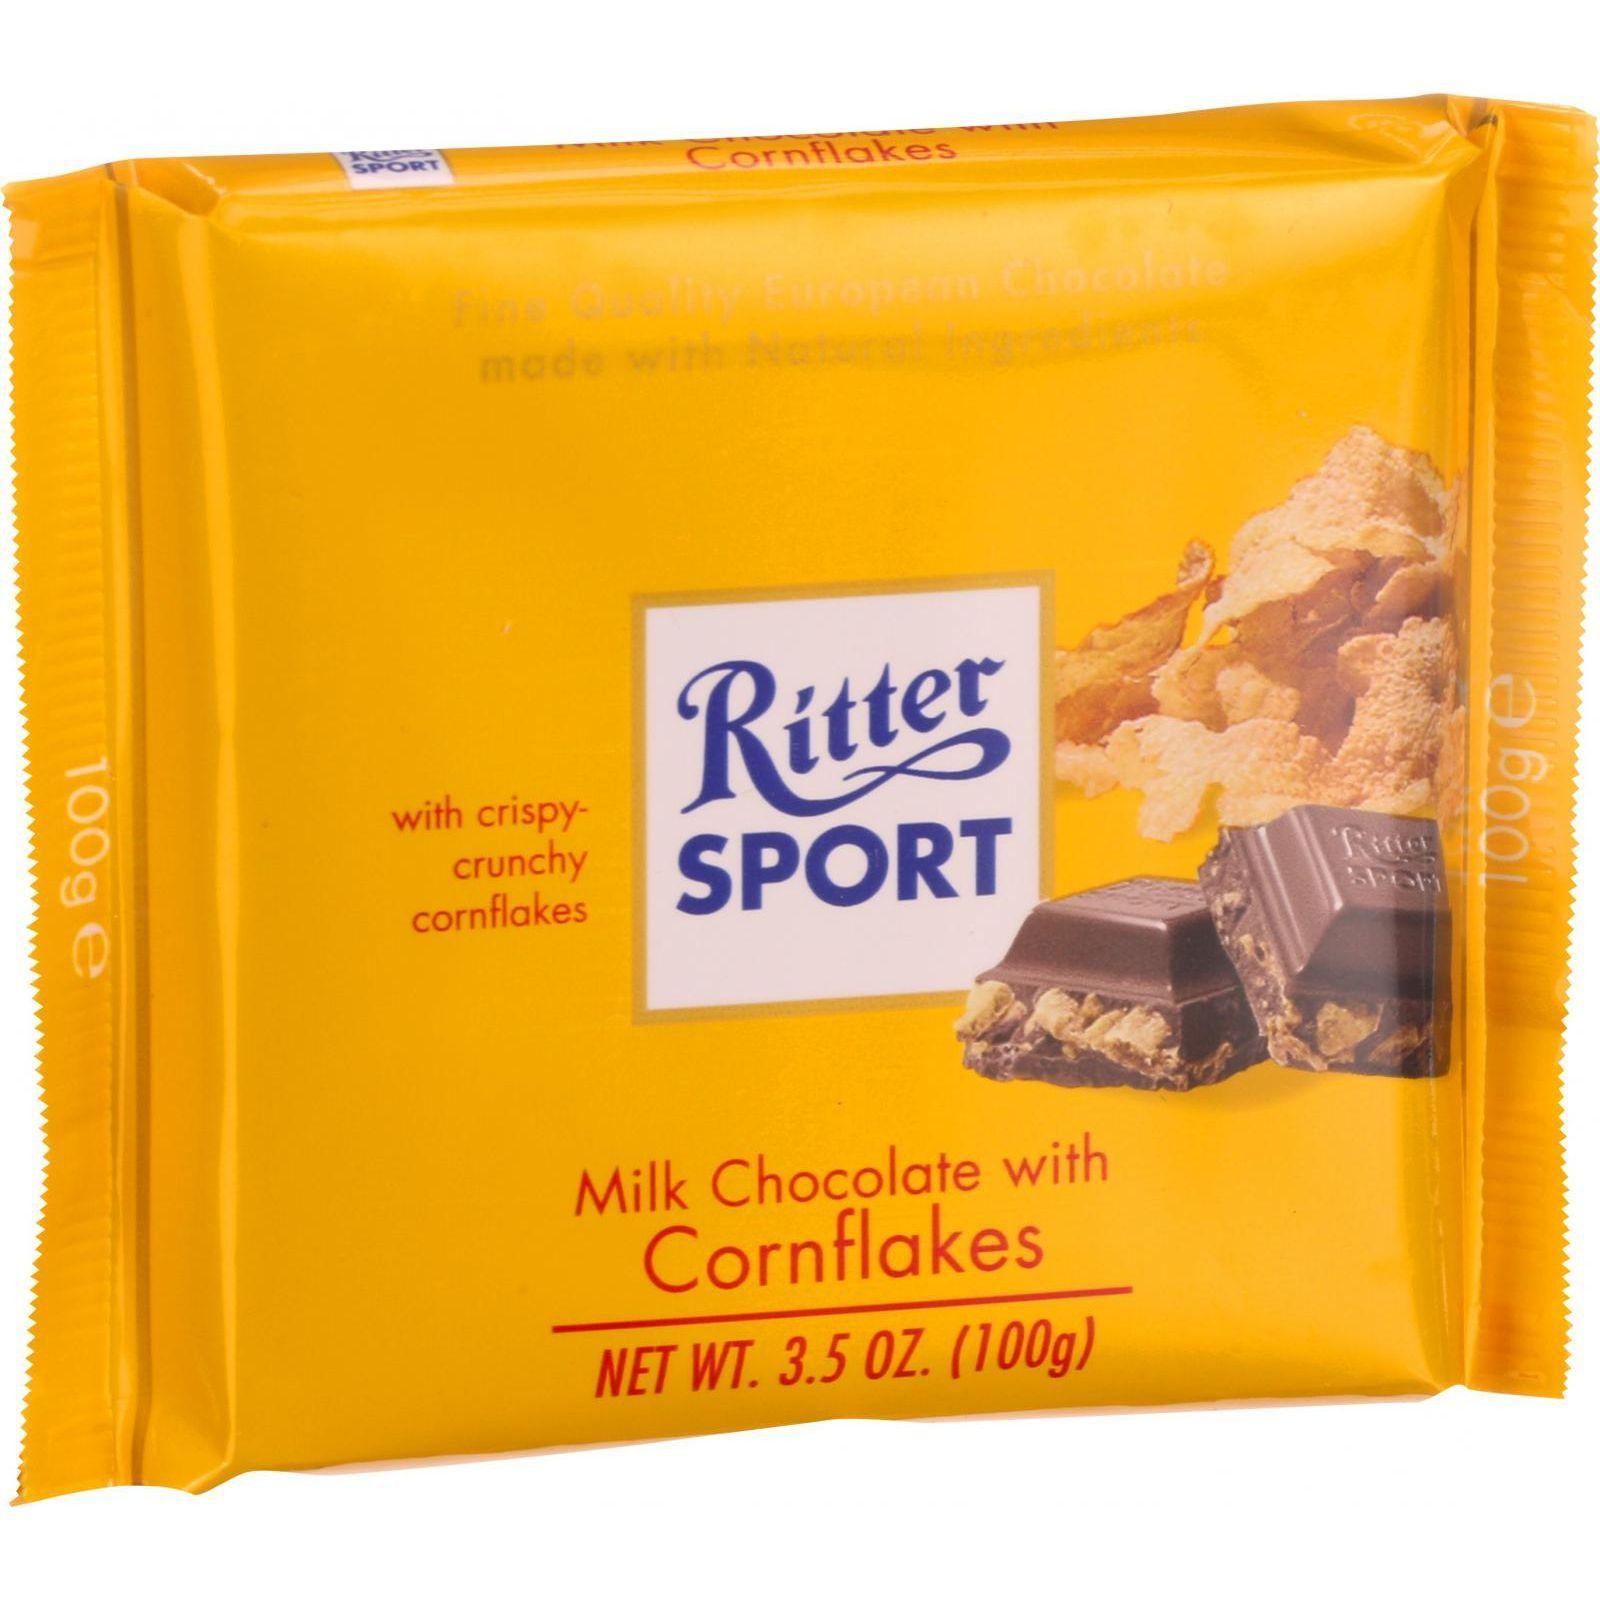 Ritter Sport Chocolate Bar Milk Chocolate Corn Flakes